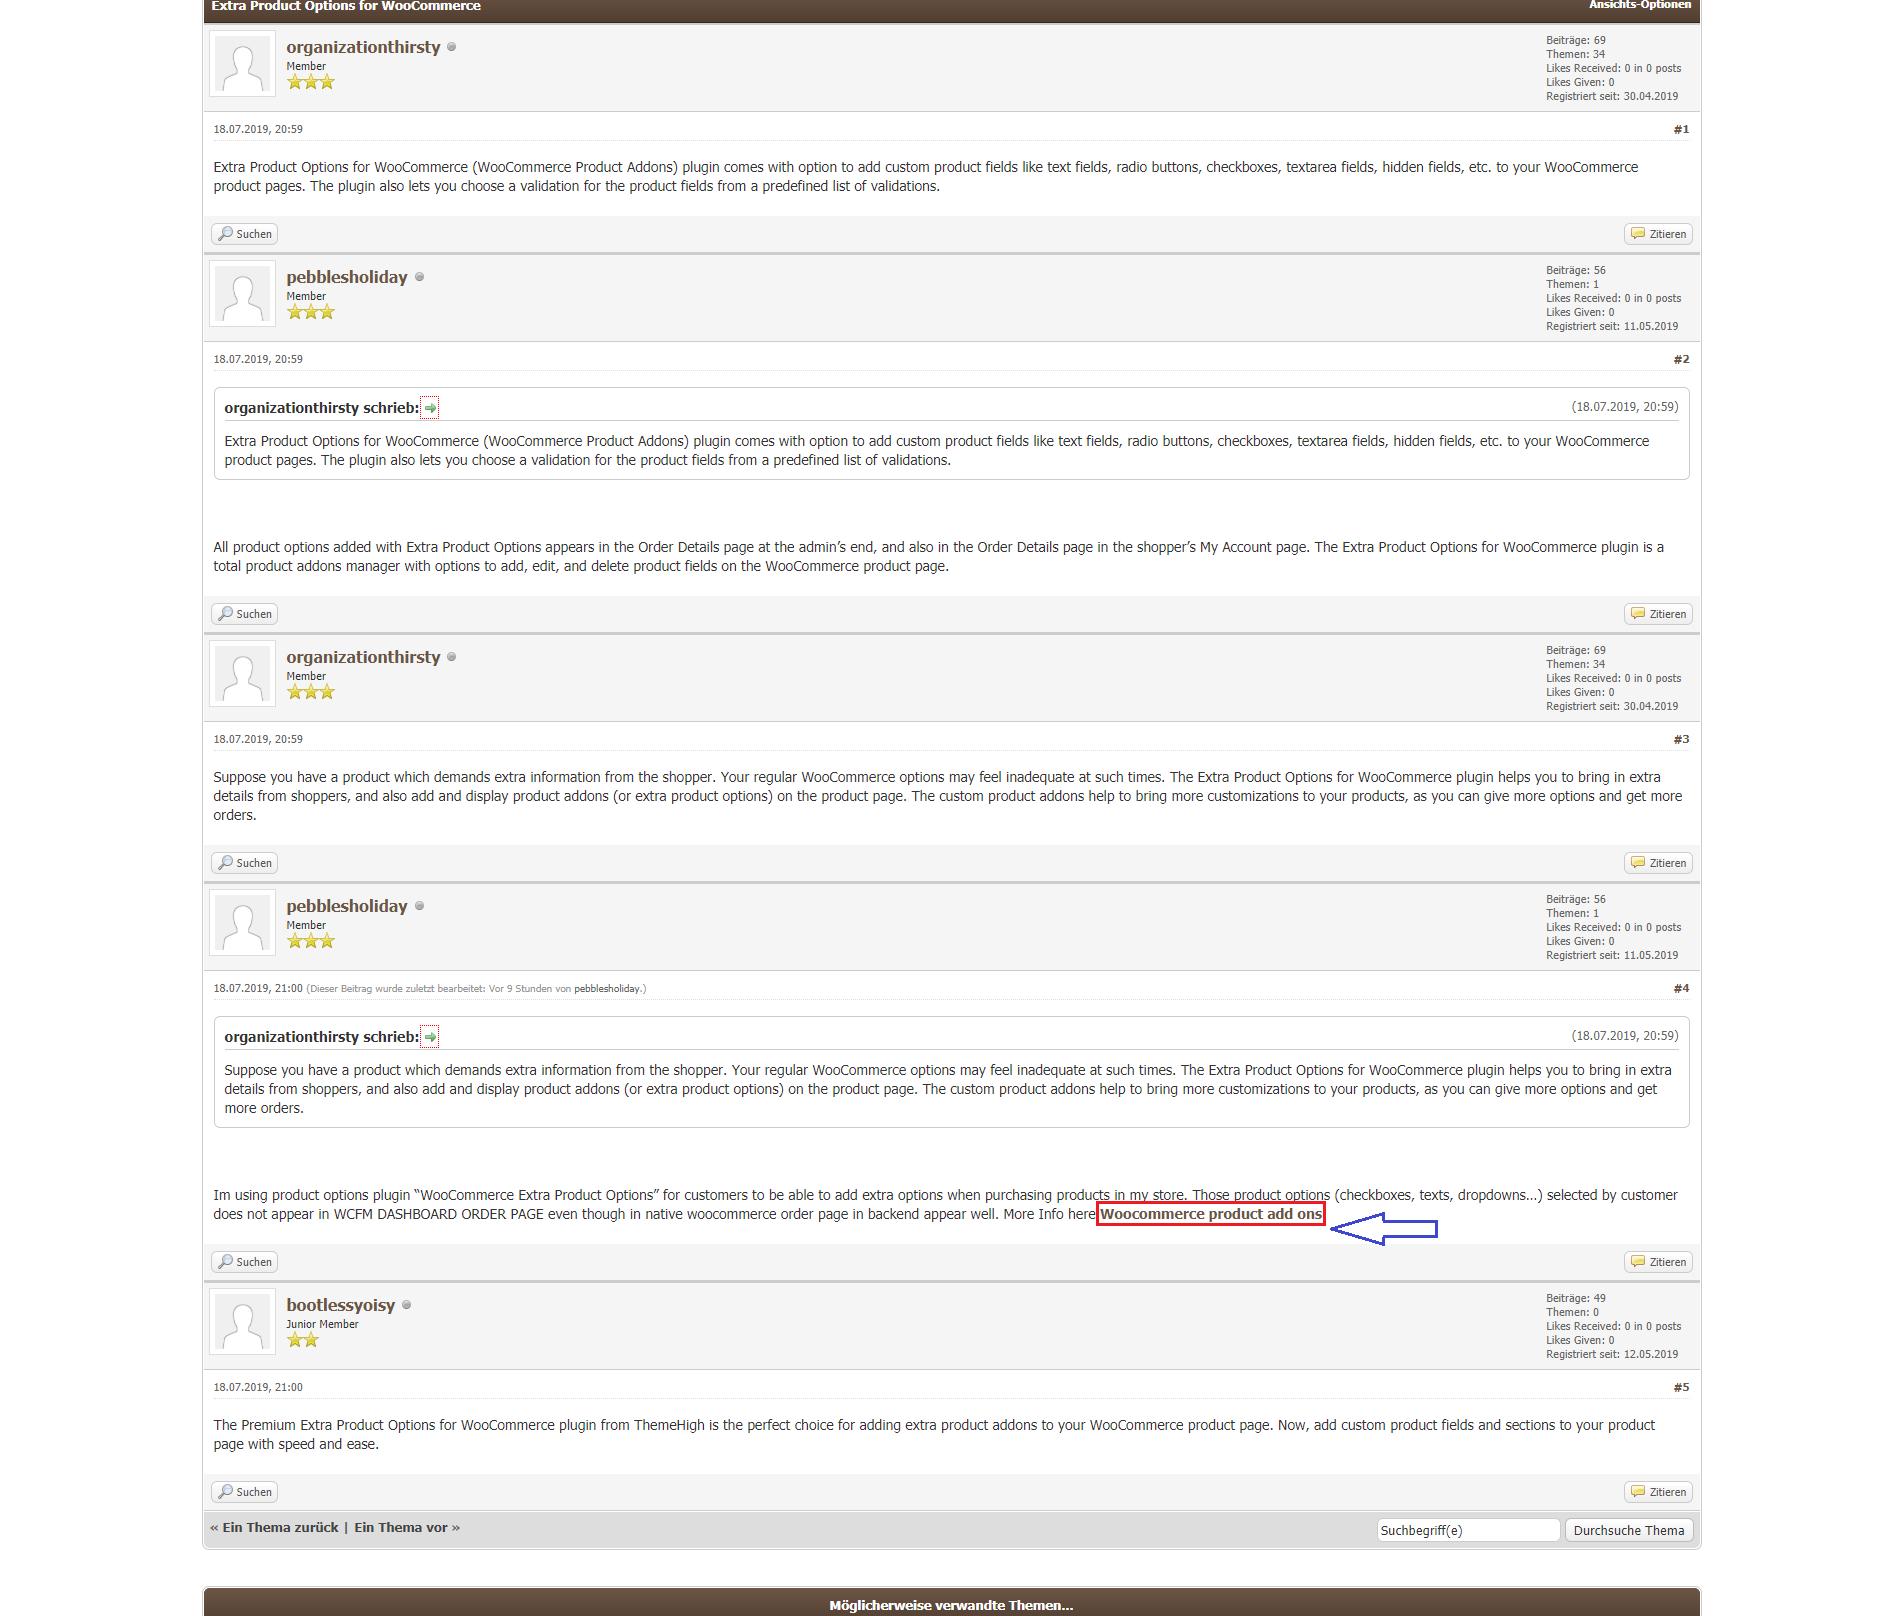 50 High authority dofollow forum posting backlinks, DA & DR 50 to 90+